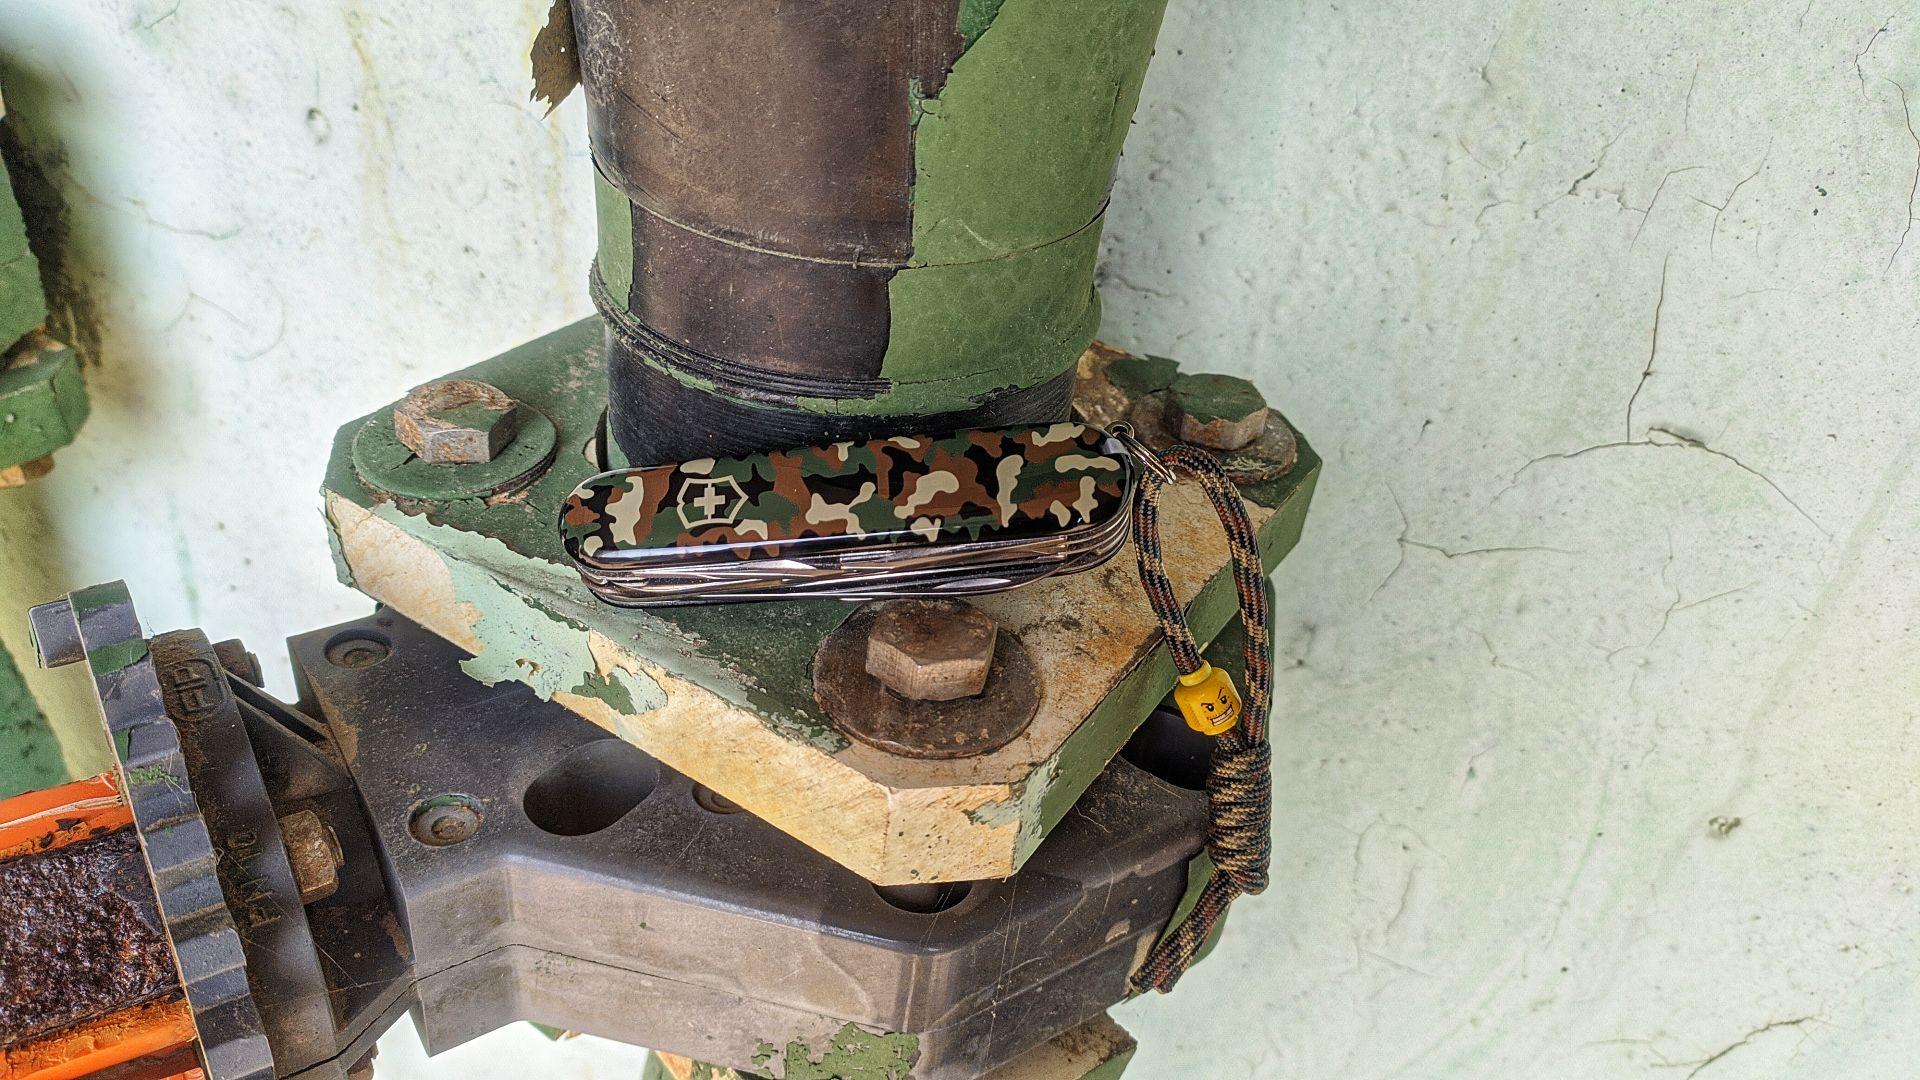 Victorinox_Huntsman_Camo_Camouflage_art_n_1.3713_maxgearedc.com_EDC_GEAR_OUTDOOR_TESTING_and_SHORT_REVIEWS_17